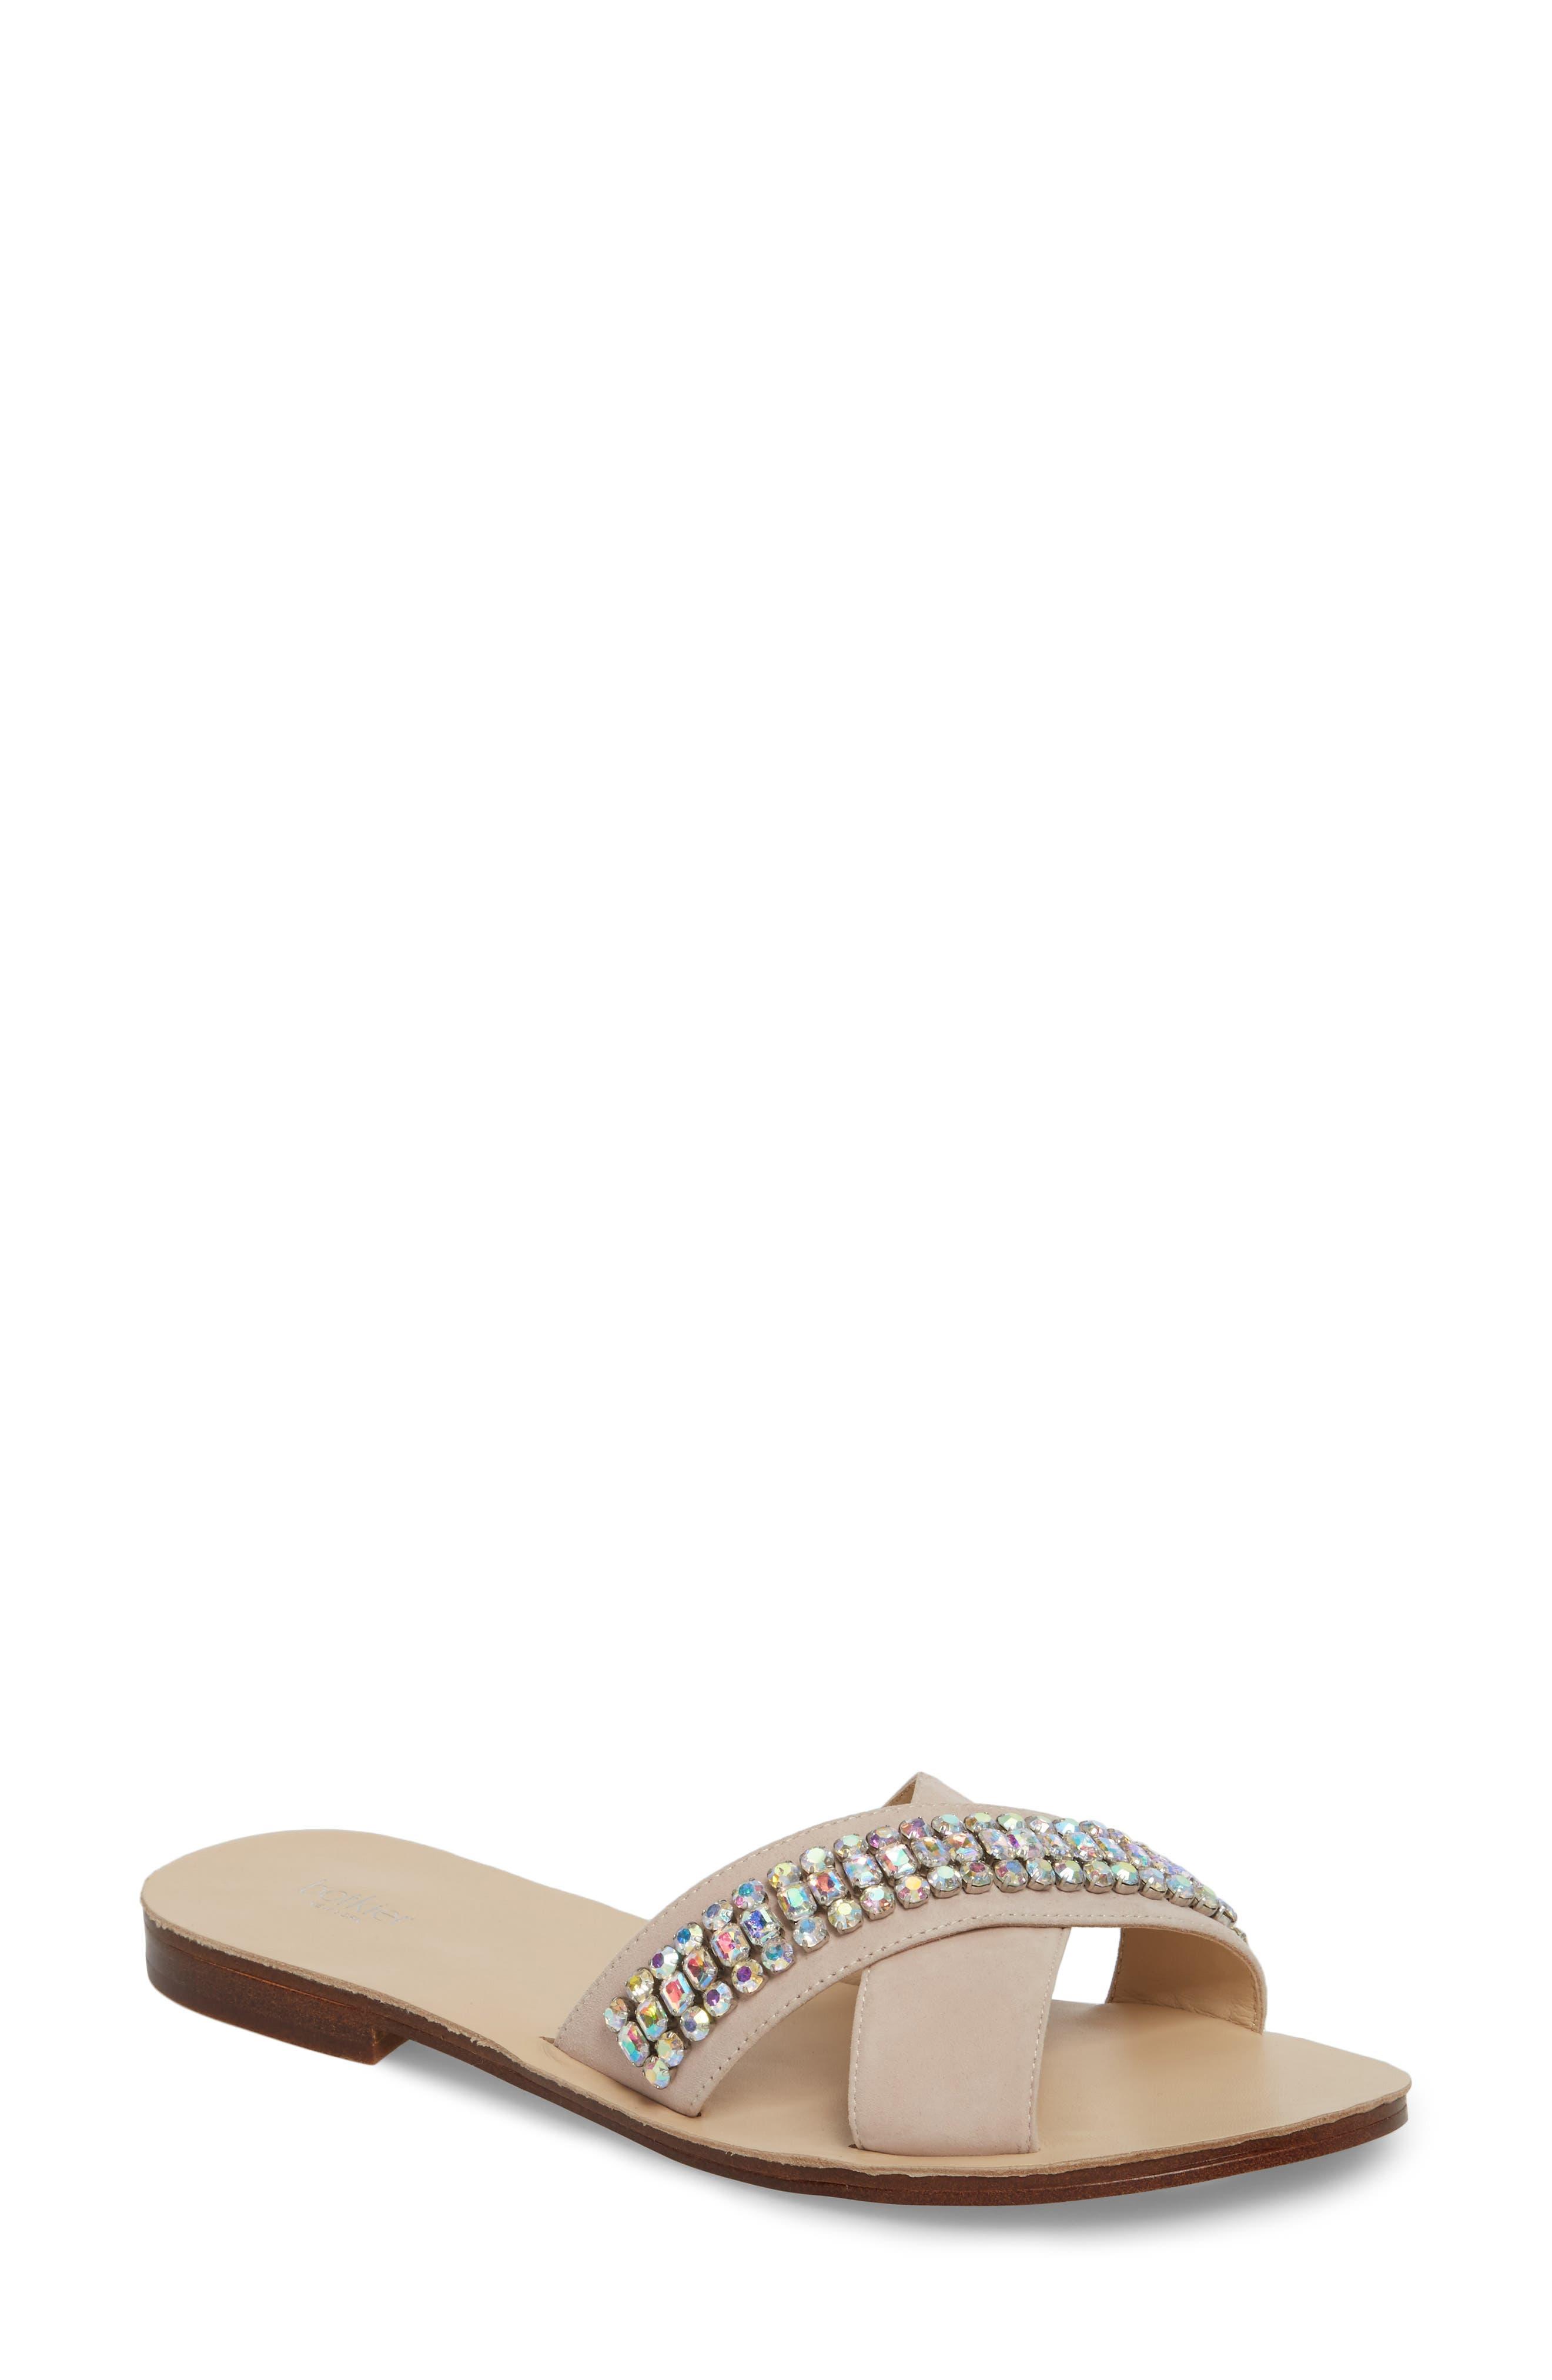 Alana Slide Sandal,                             Main thumbnail 1, color,                             Blush Stone Suede